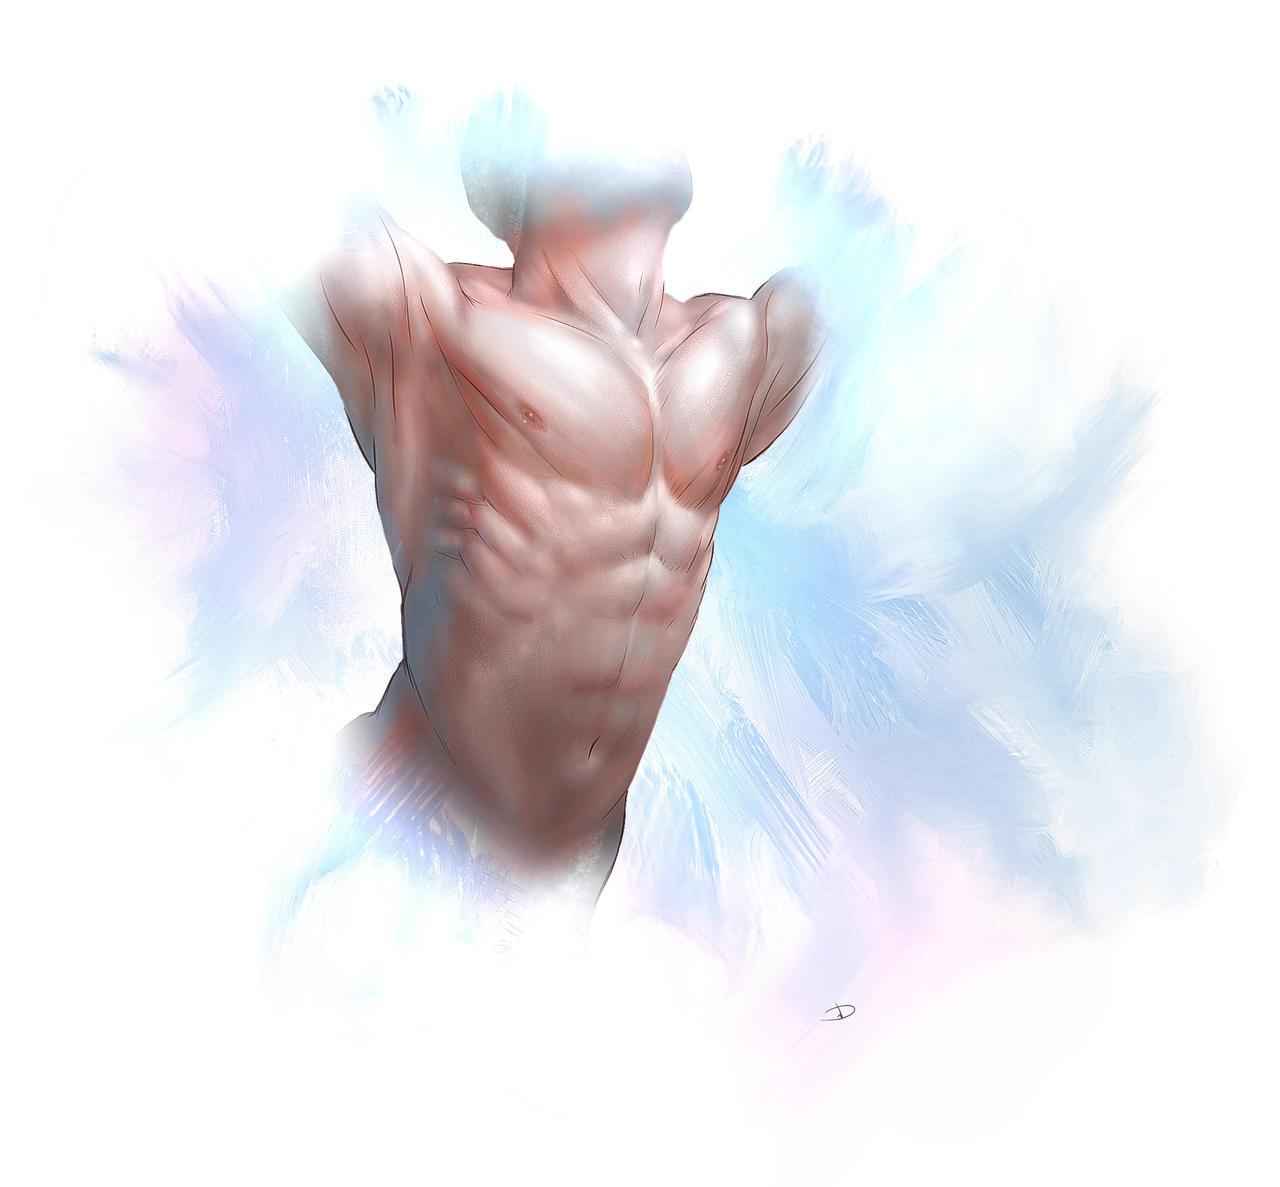 Study male torso by PeppeTi